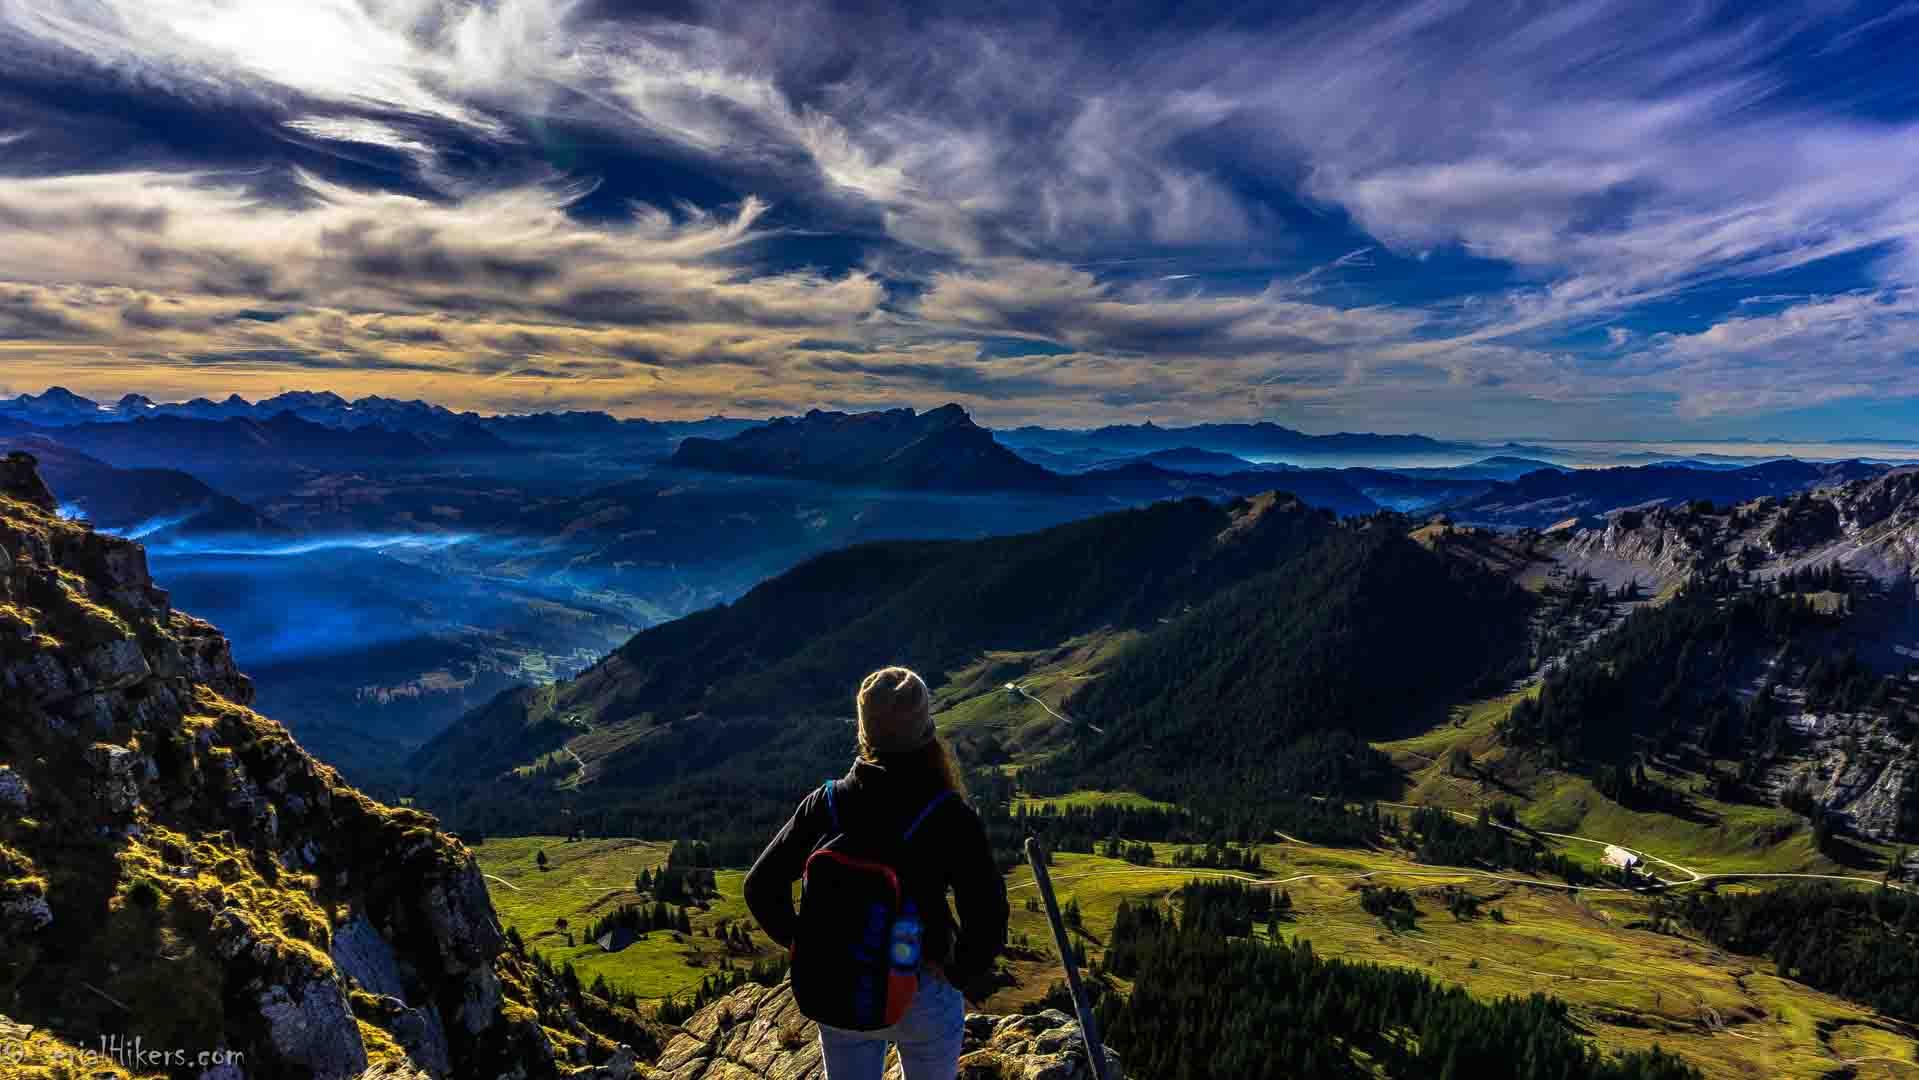 SerialHikers stop autostop world monde tour hitchhiking aventure adventure alternative travel voyage sans avion no fly montagnes suisse